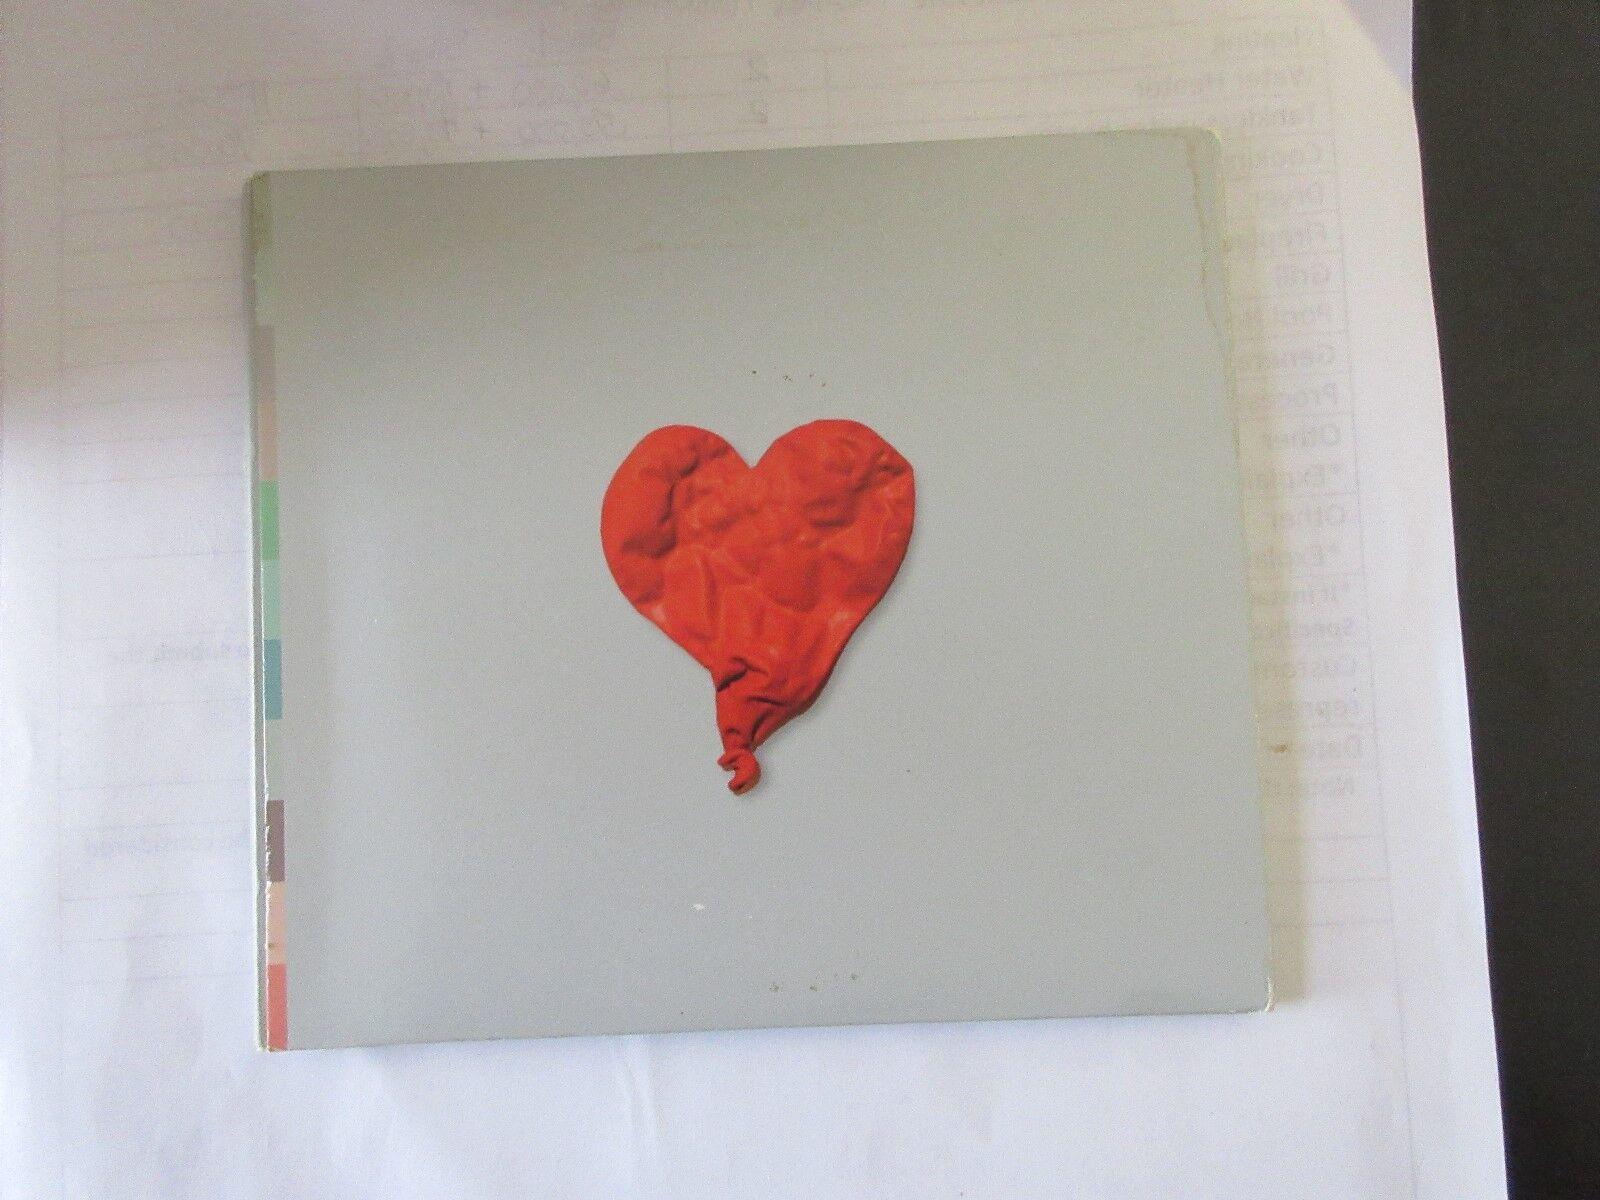 Kanye West , 808' and Heartbreak , CD